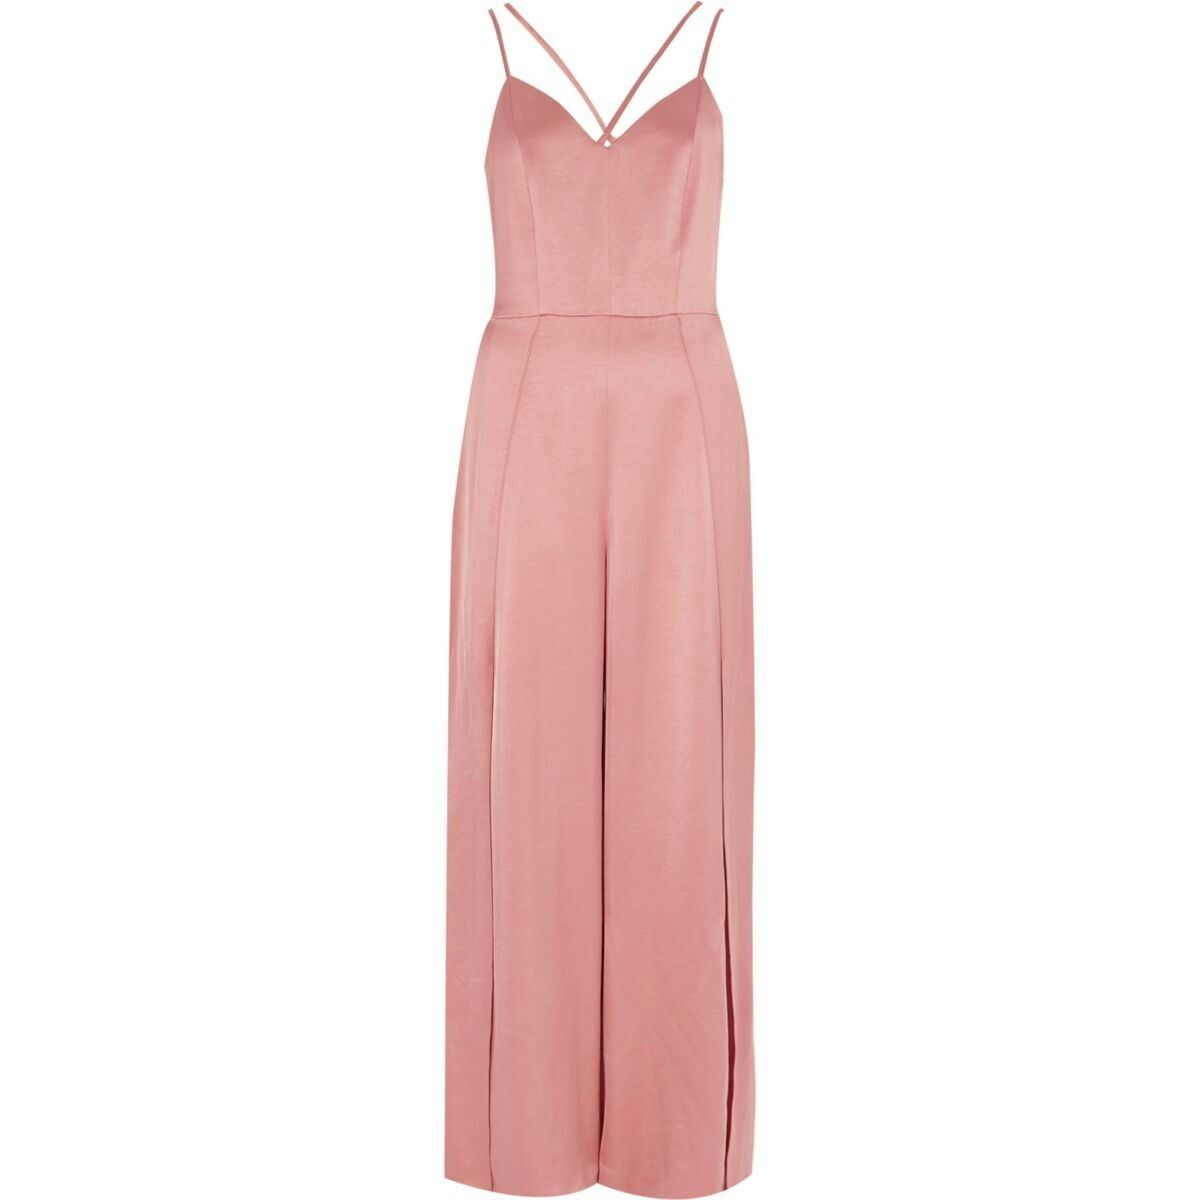 9e2f8a93255 Light pink strappy cami split leg jumpsuit